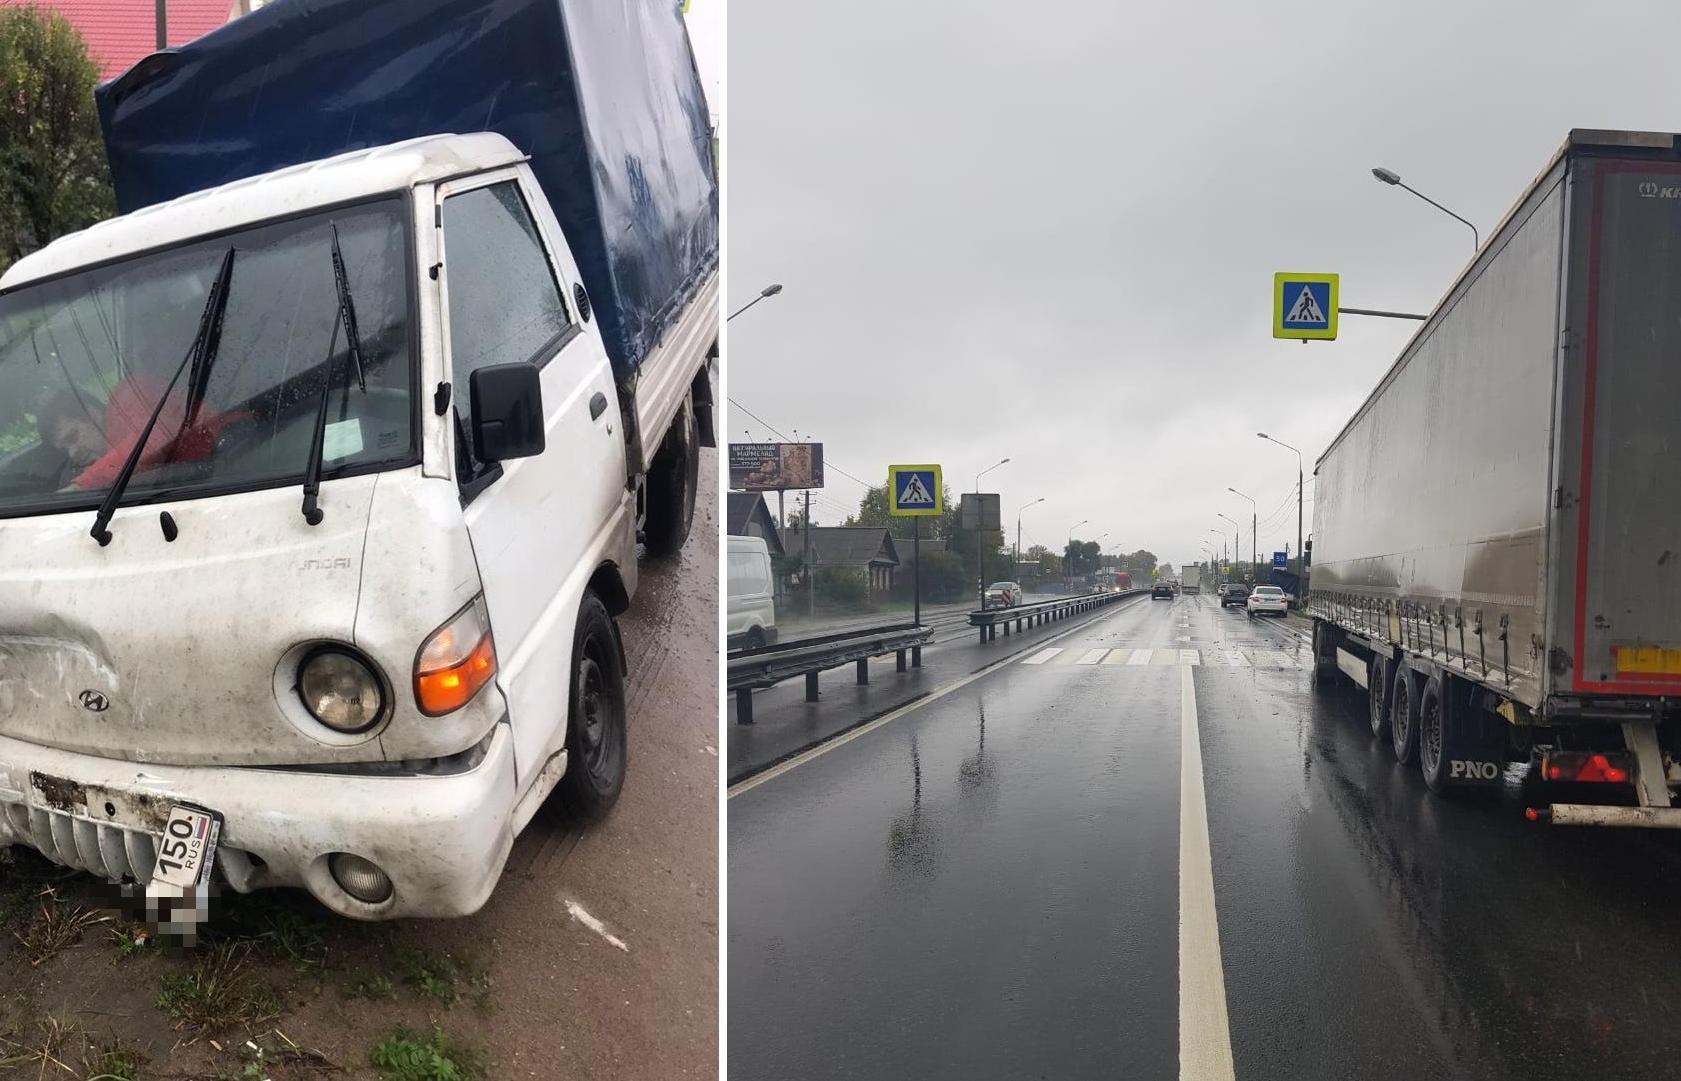 Под Тверью на М10 столкнулись три автомобиля - новости Афанасий